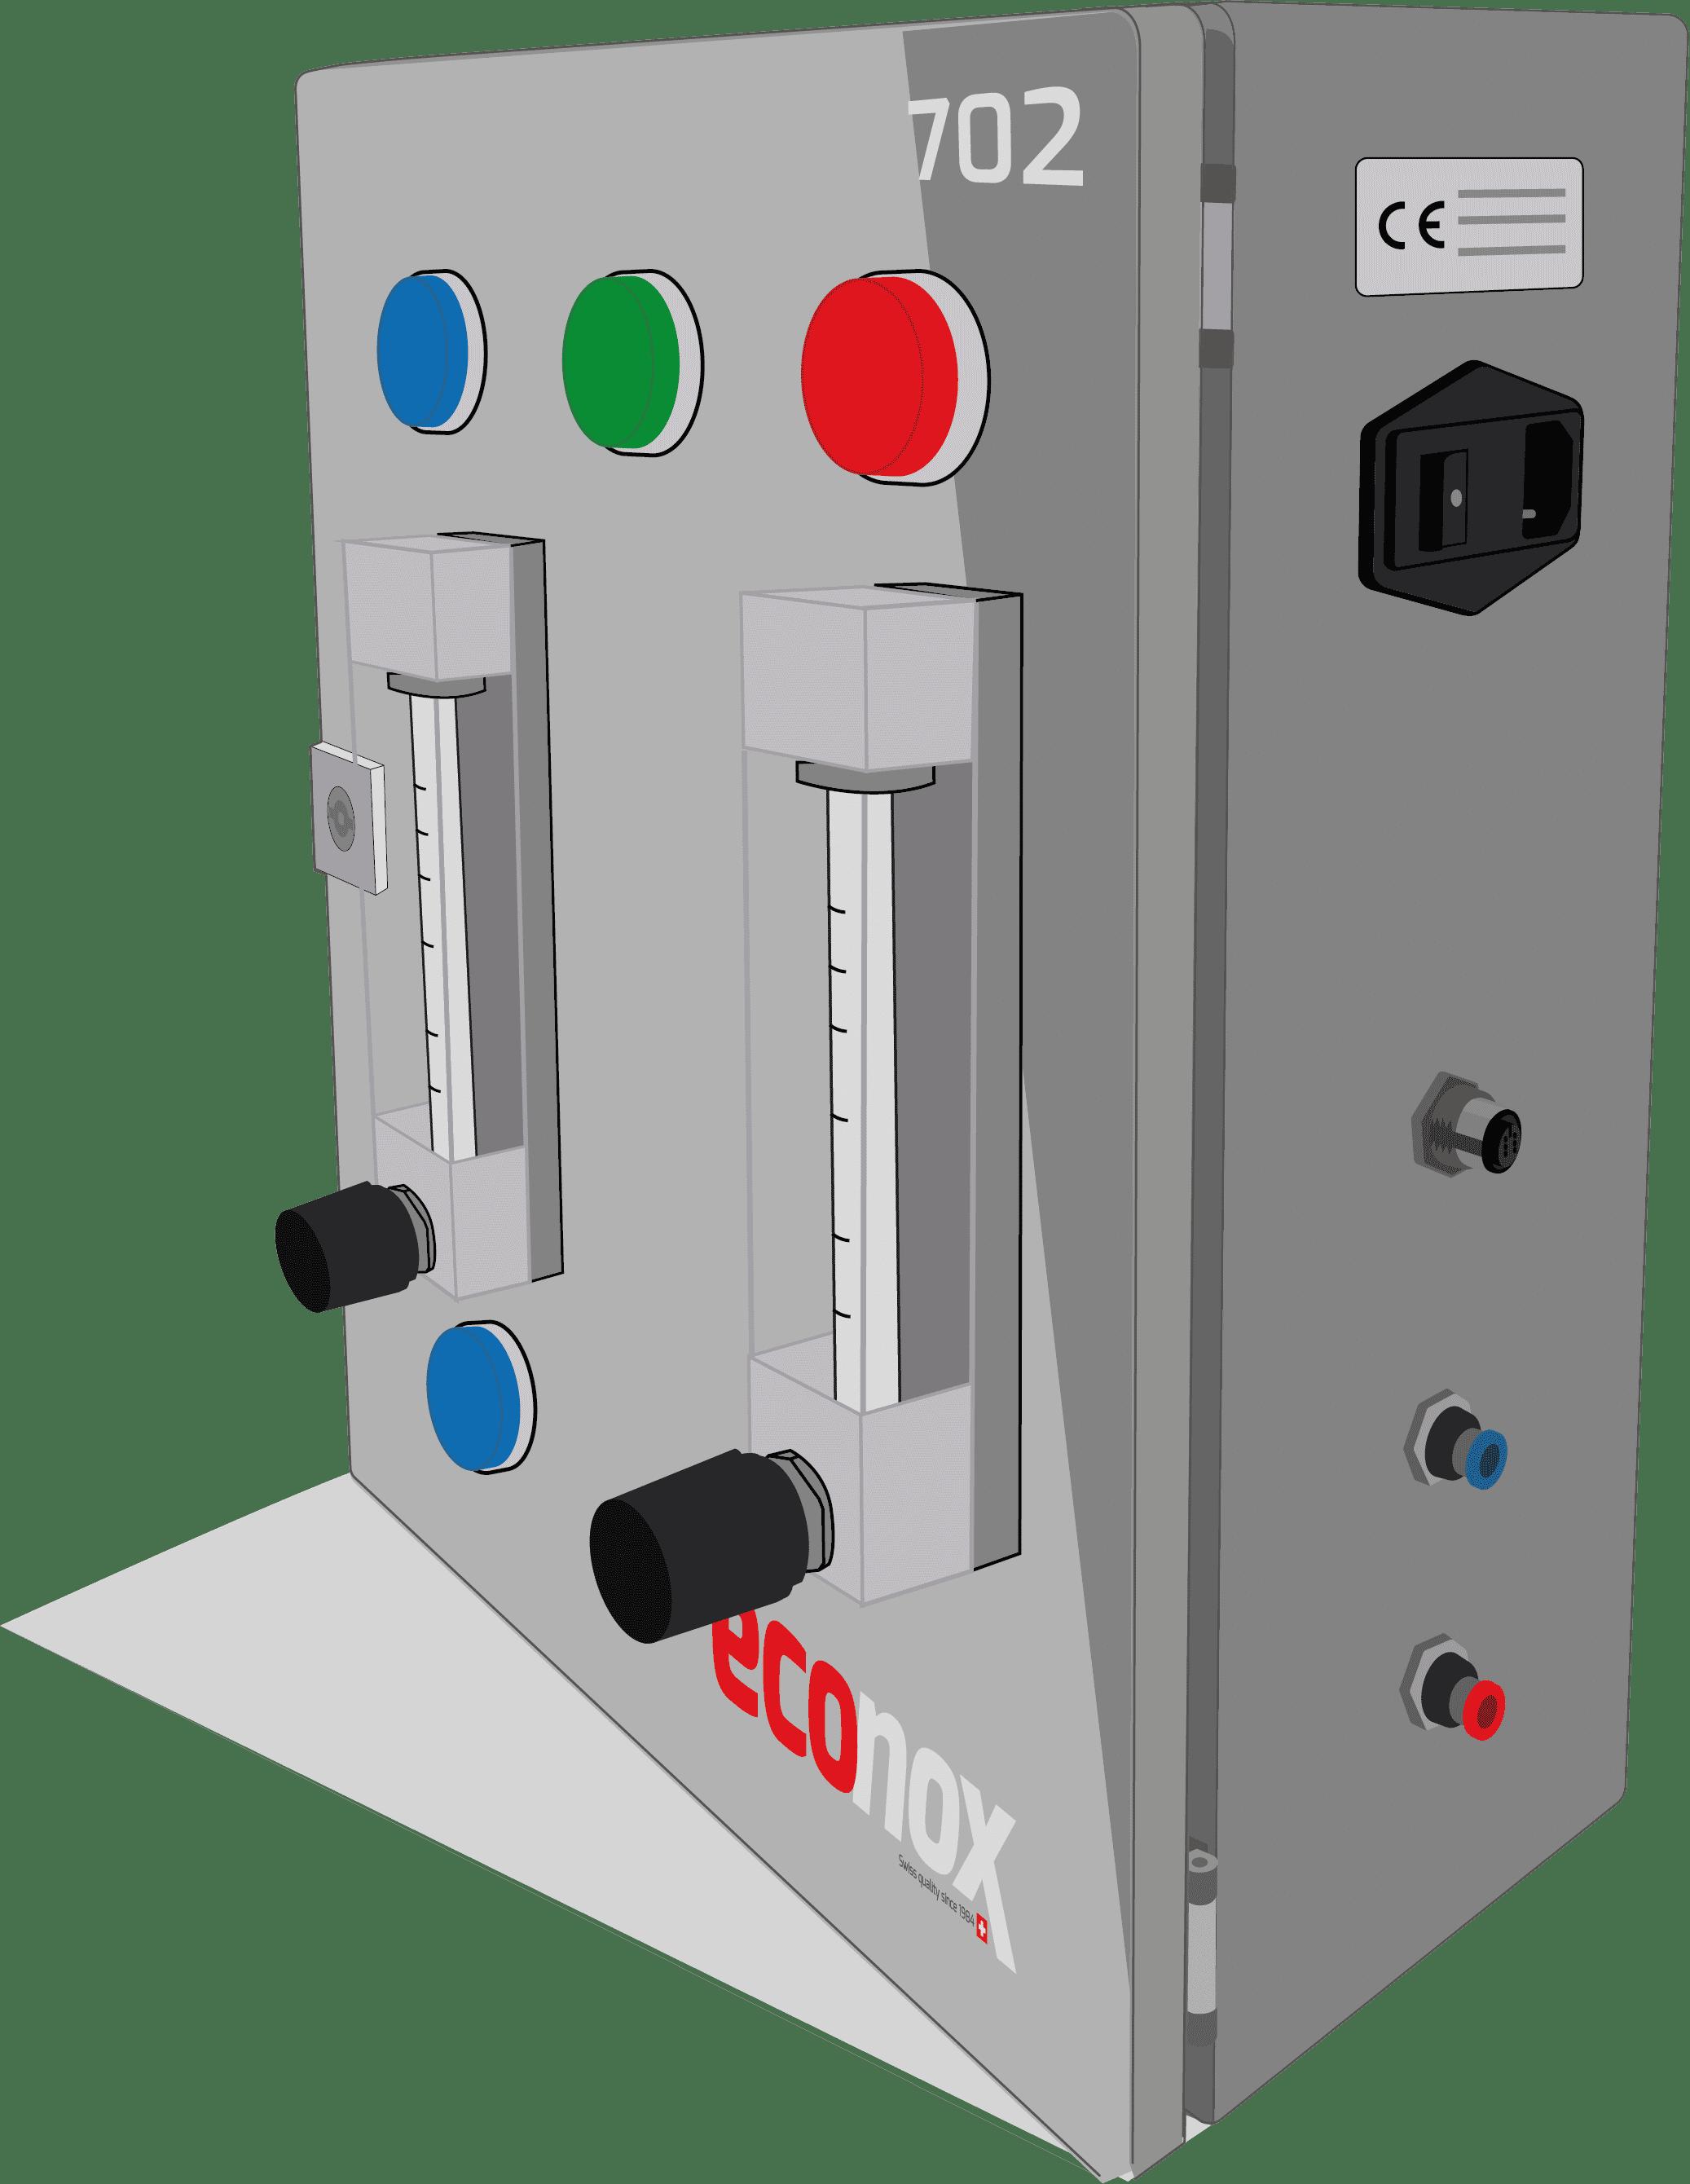 Maintenance Module 702